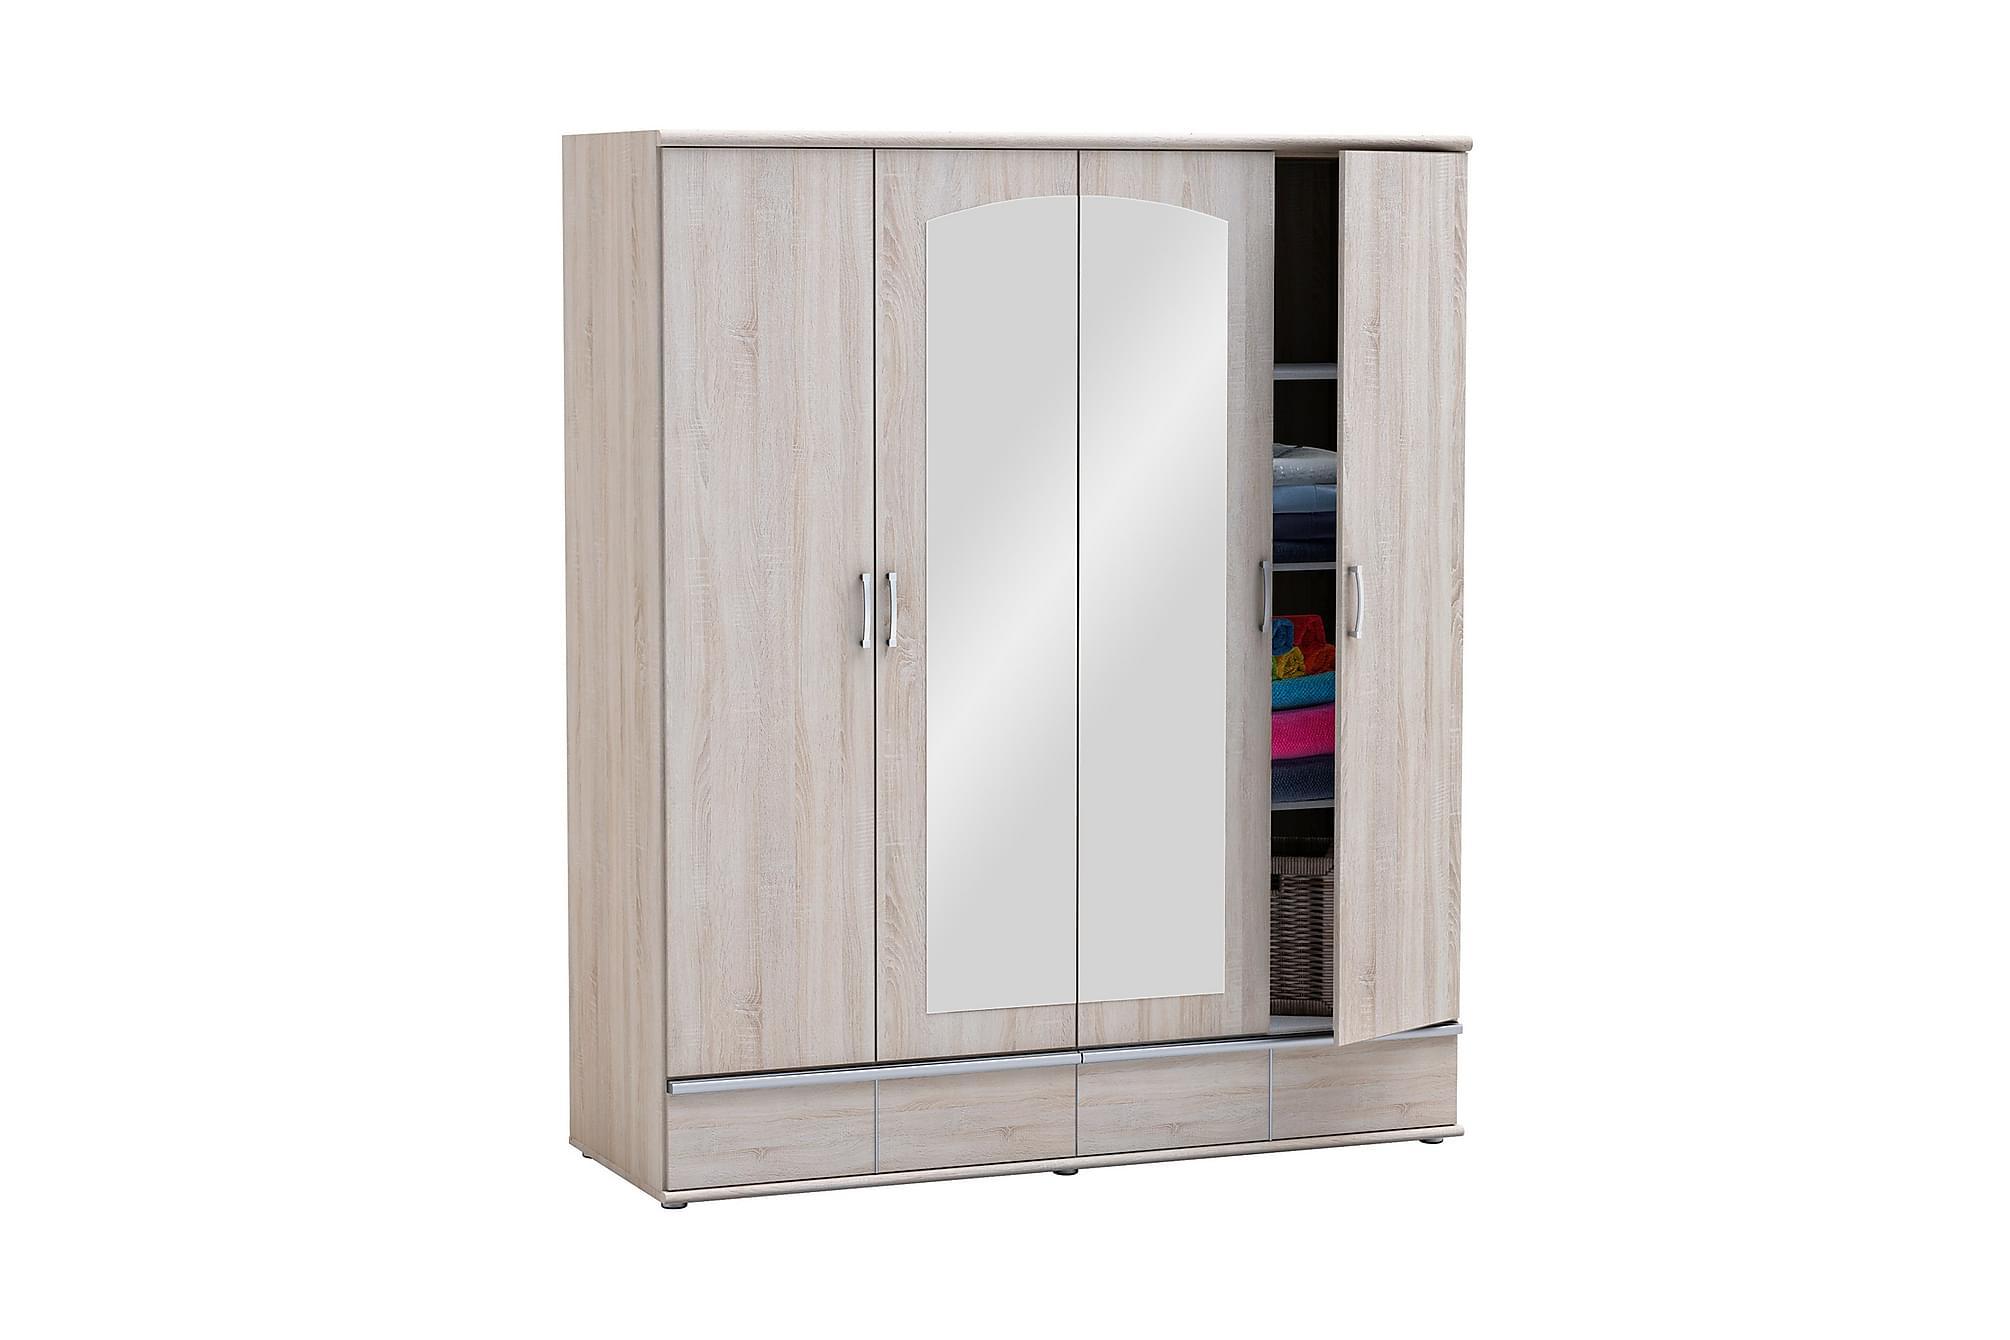 SQUARE Garderob 172 4 Dörrar Spegel Borstad Ek